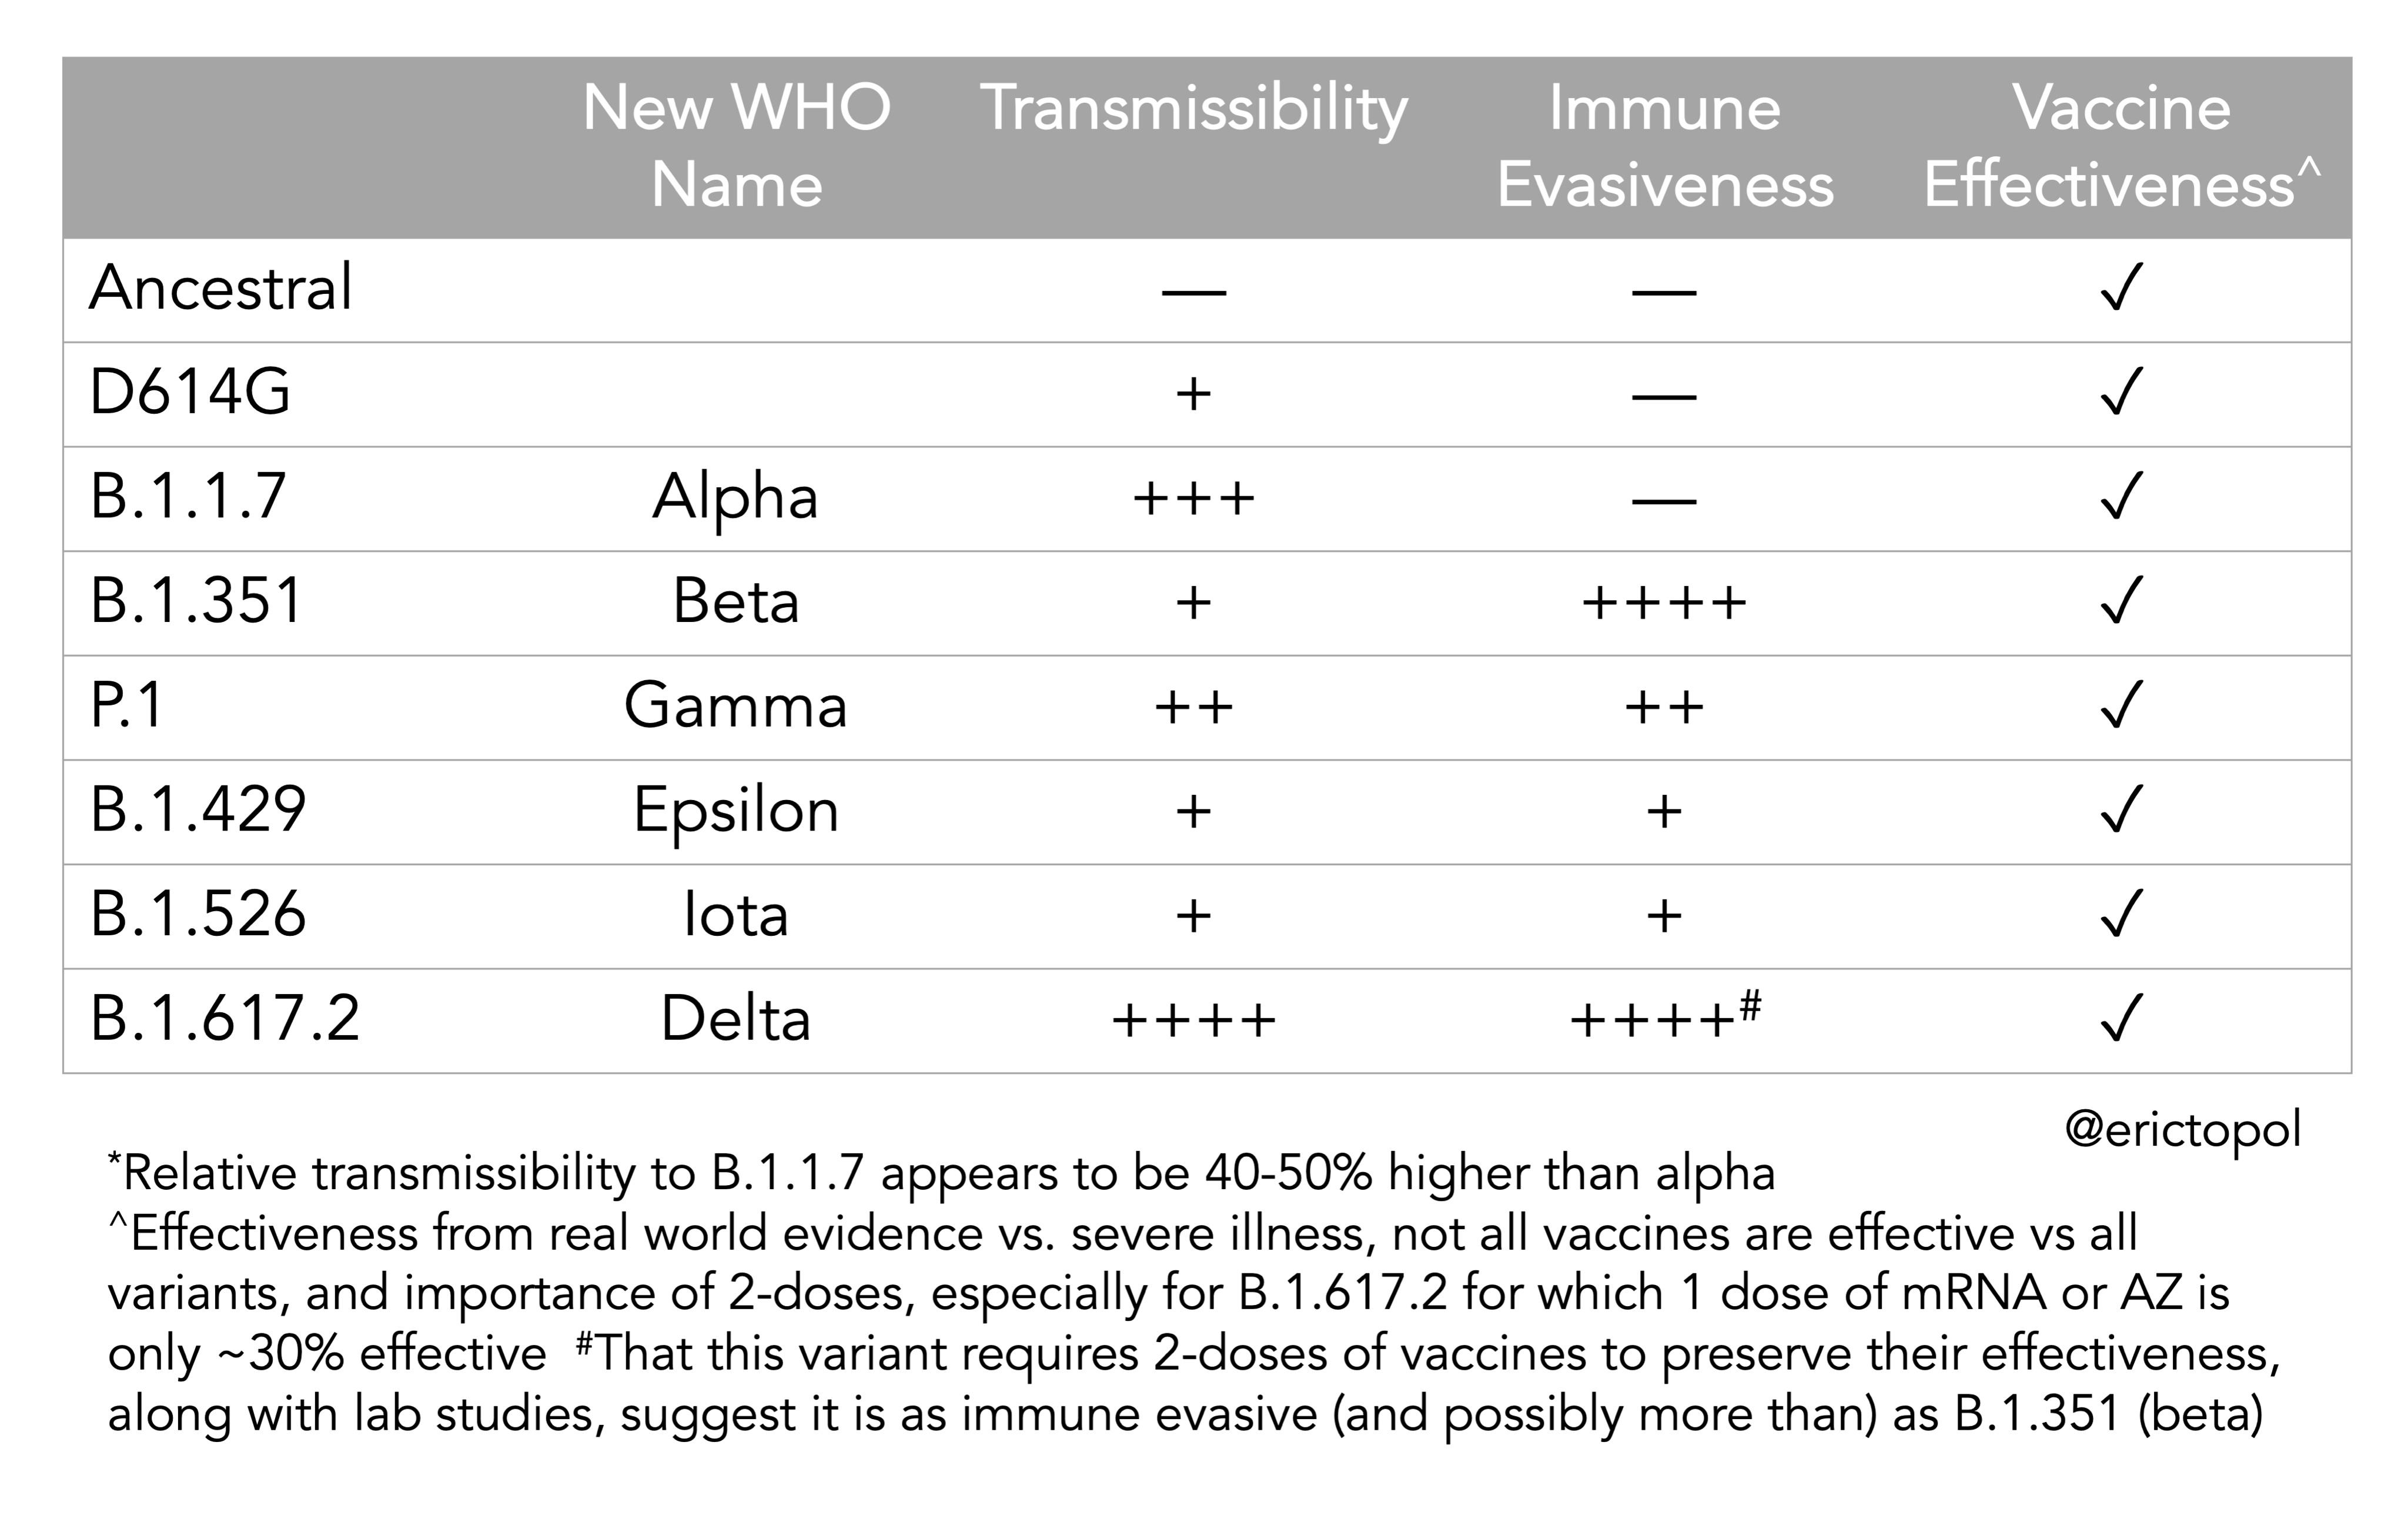 Le coronavirus COVID-19 - Infos, évolution et conséquences - Page 15 E3N3W07UUAYrp89?format=jpg&name=4096x4096